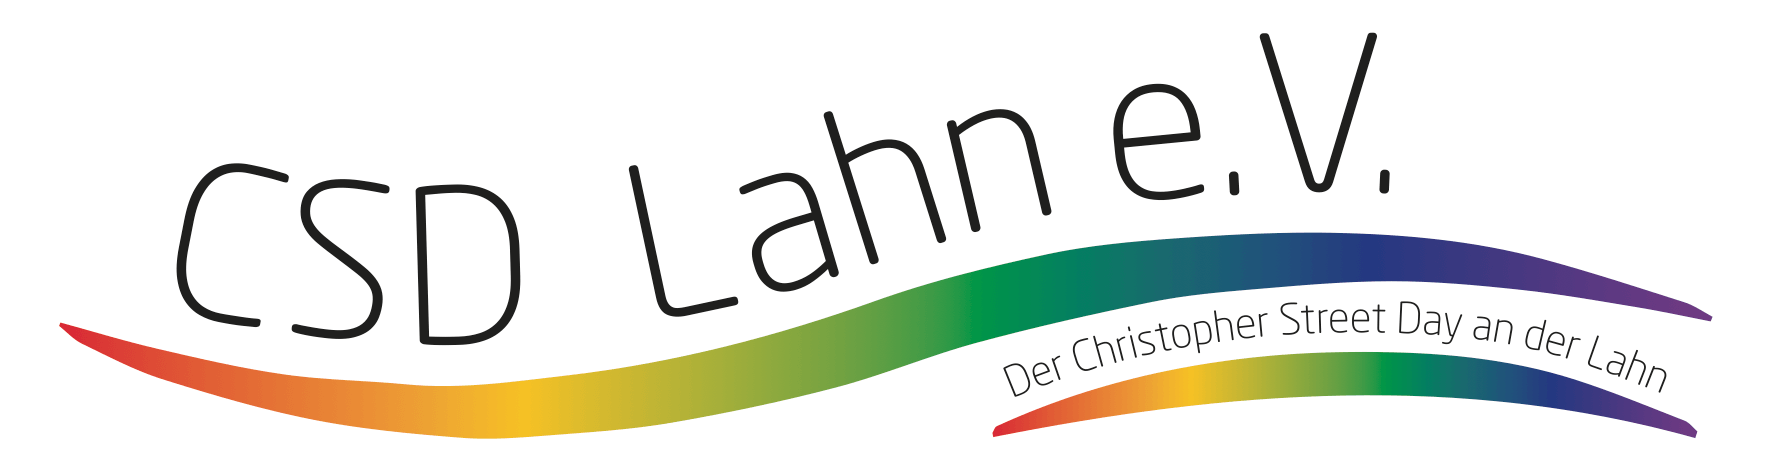 CSD Lahn Logo cmyk